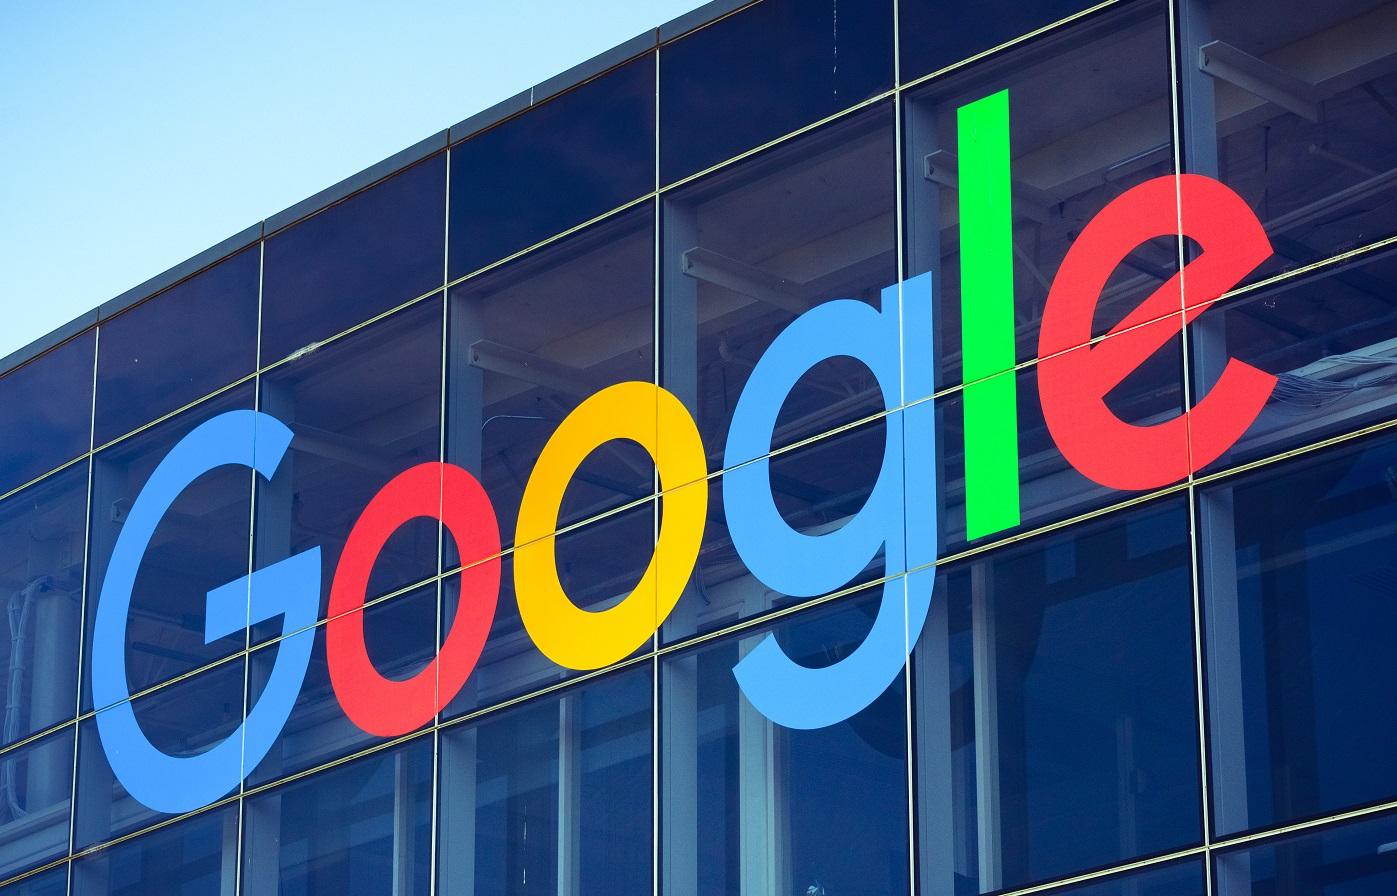 shutterstock_google logo office